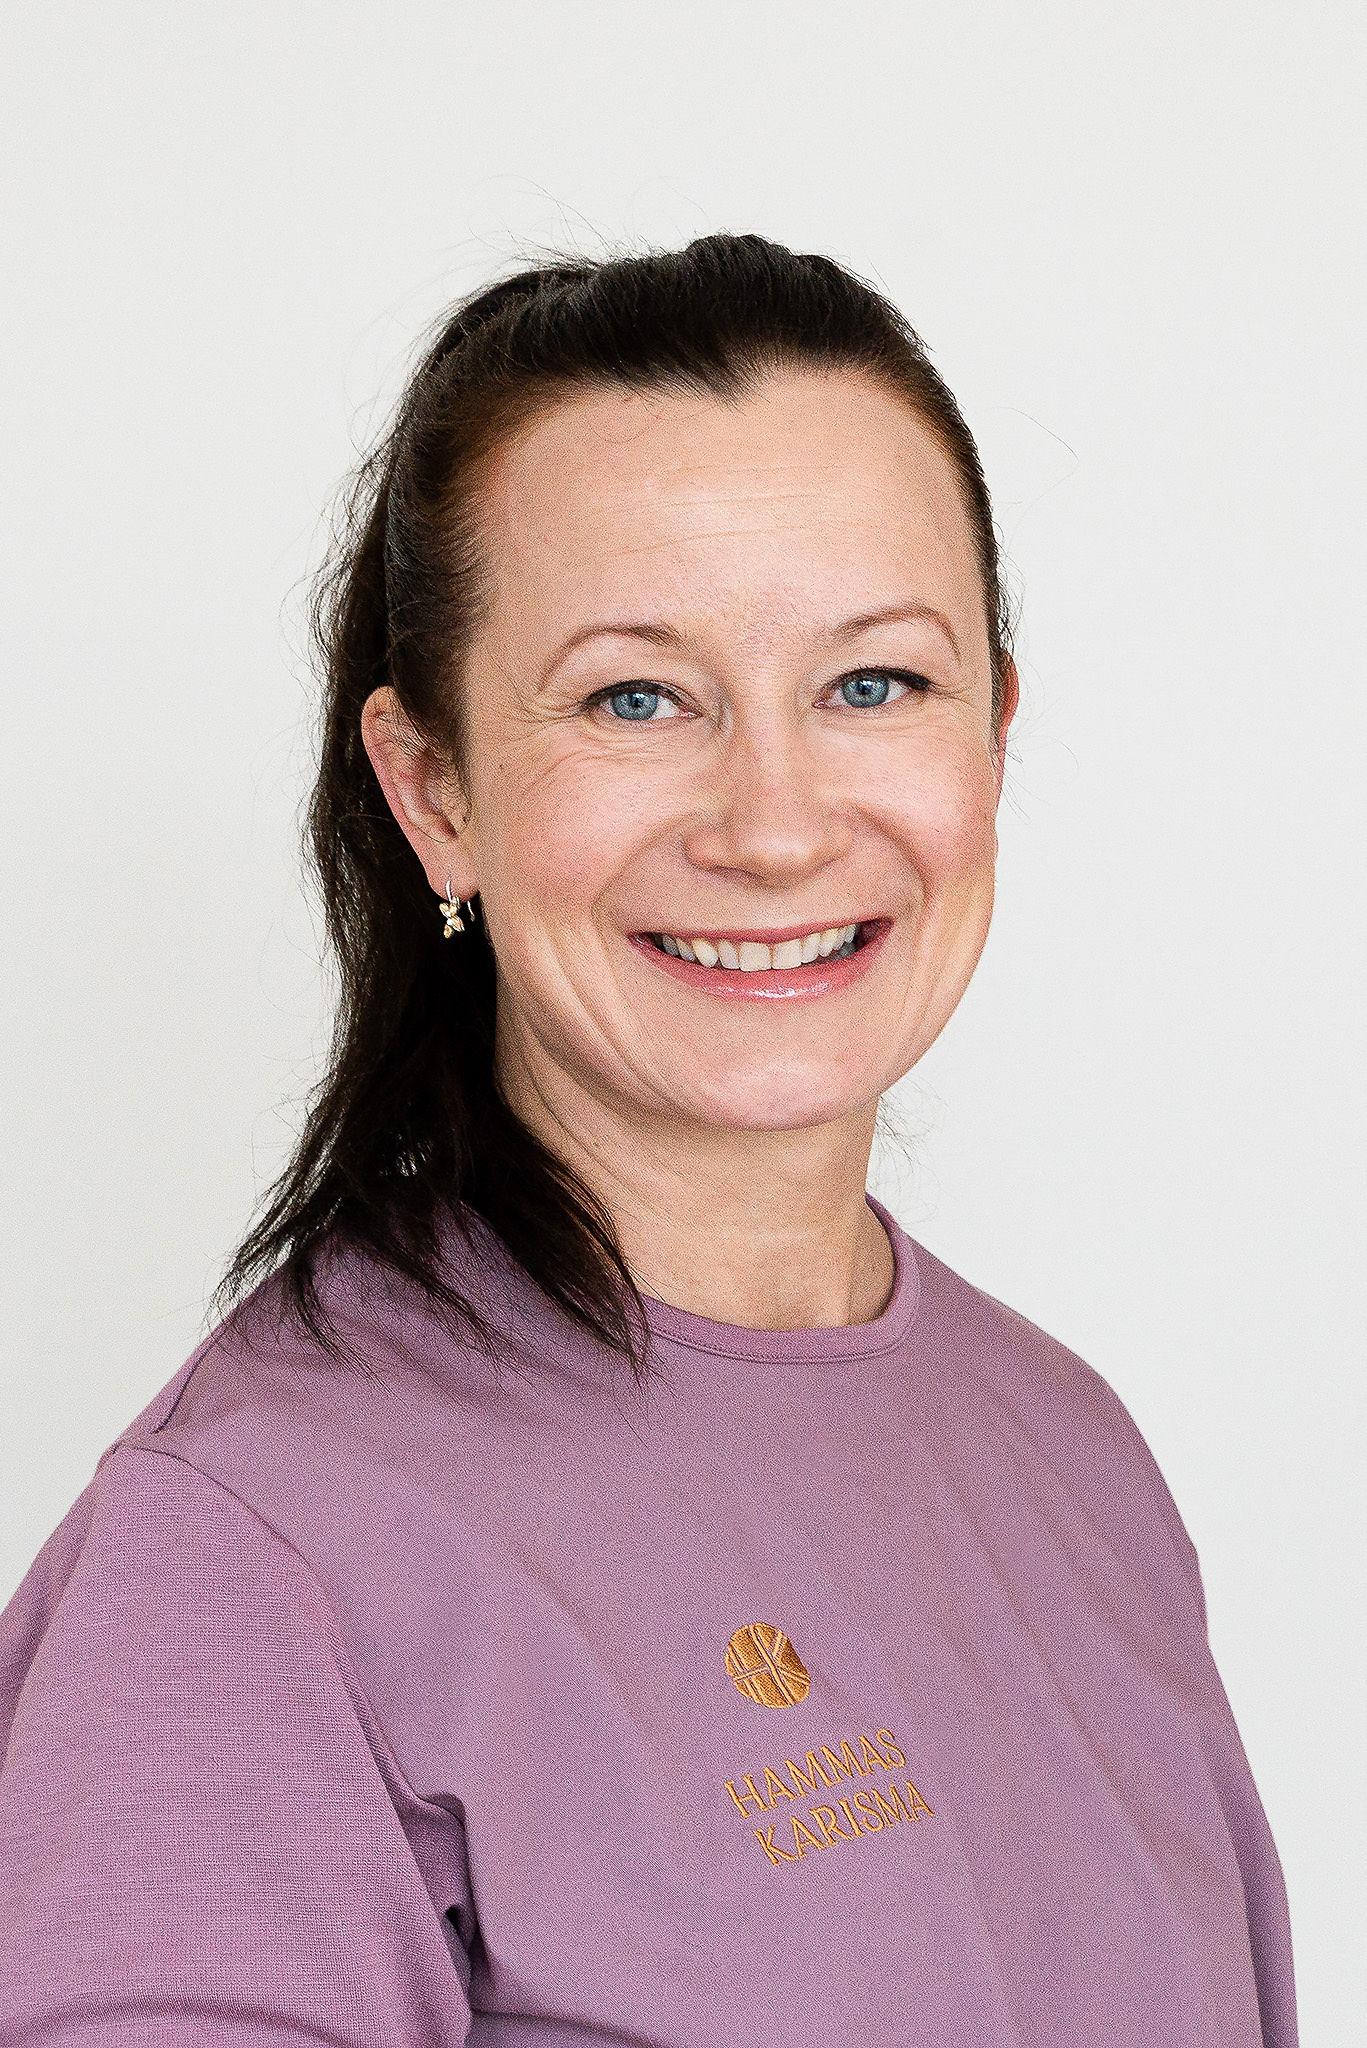 Katja Konsi